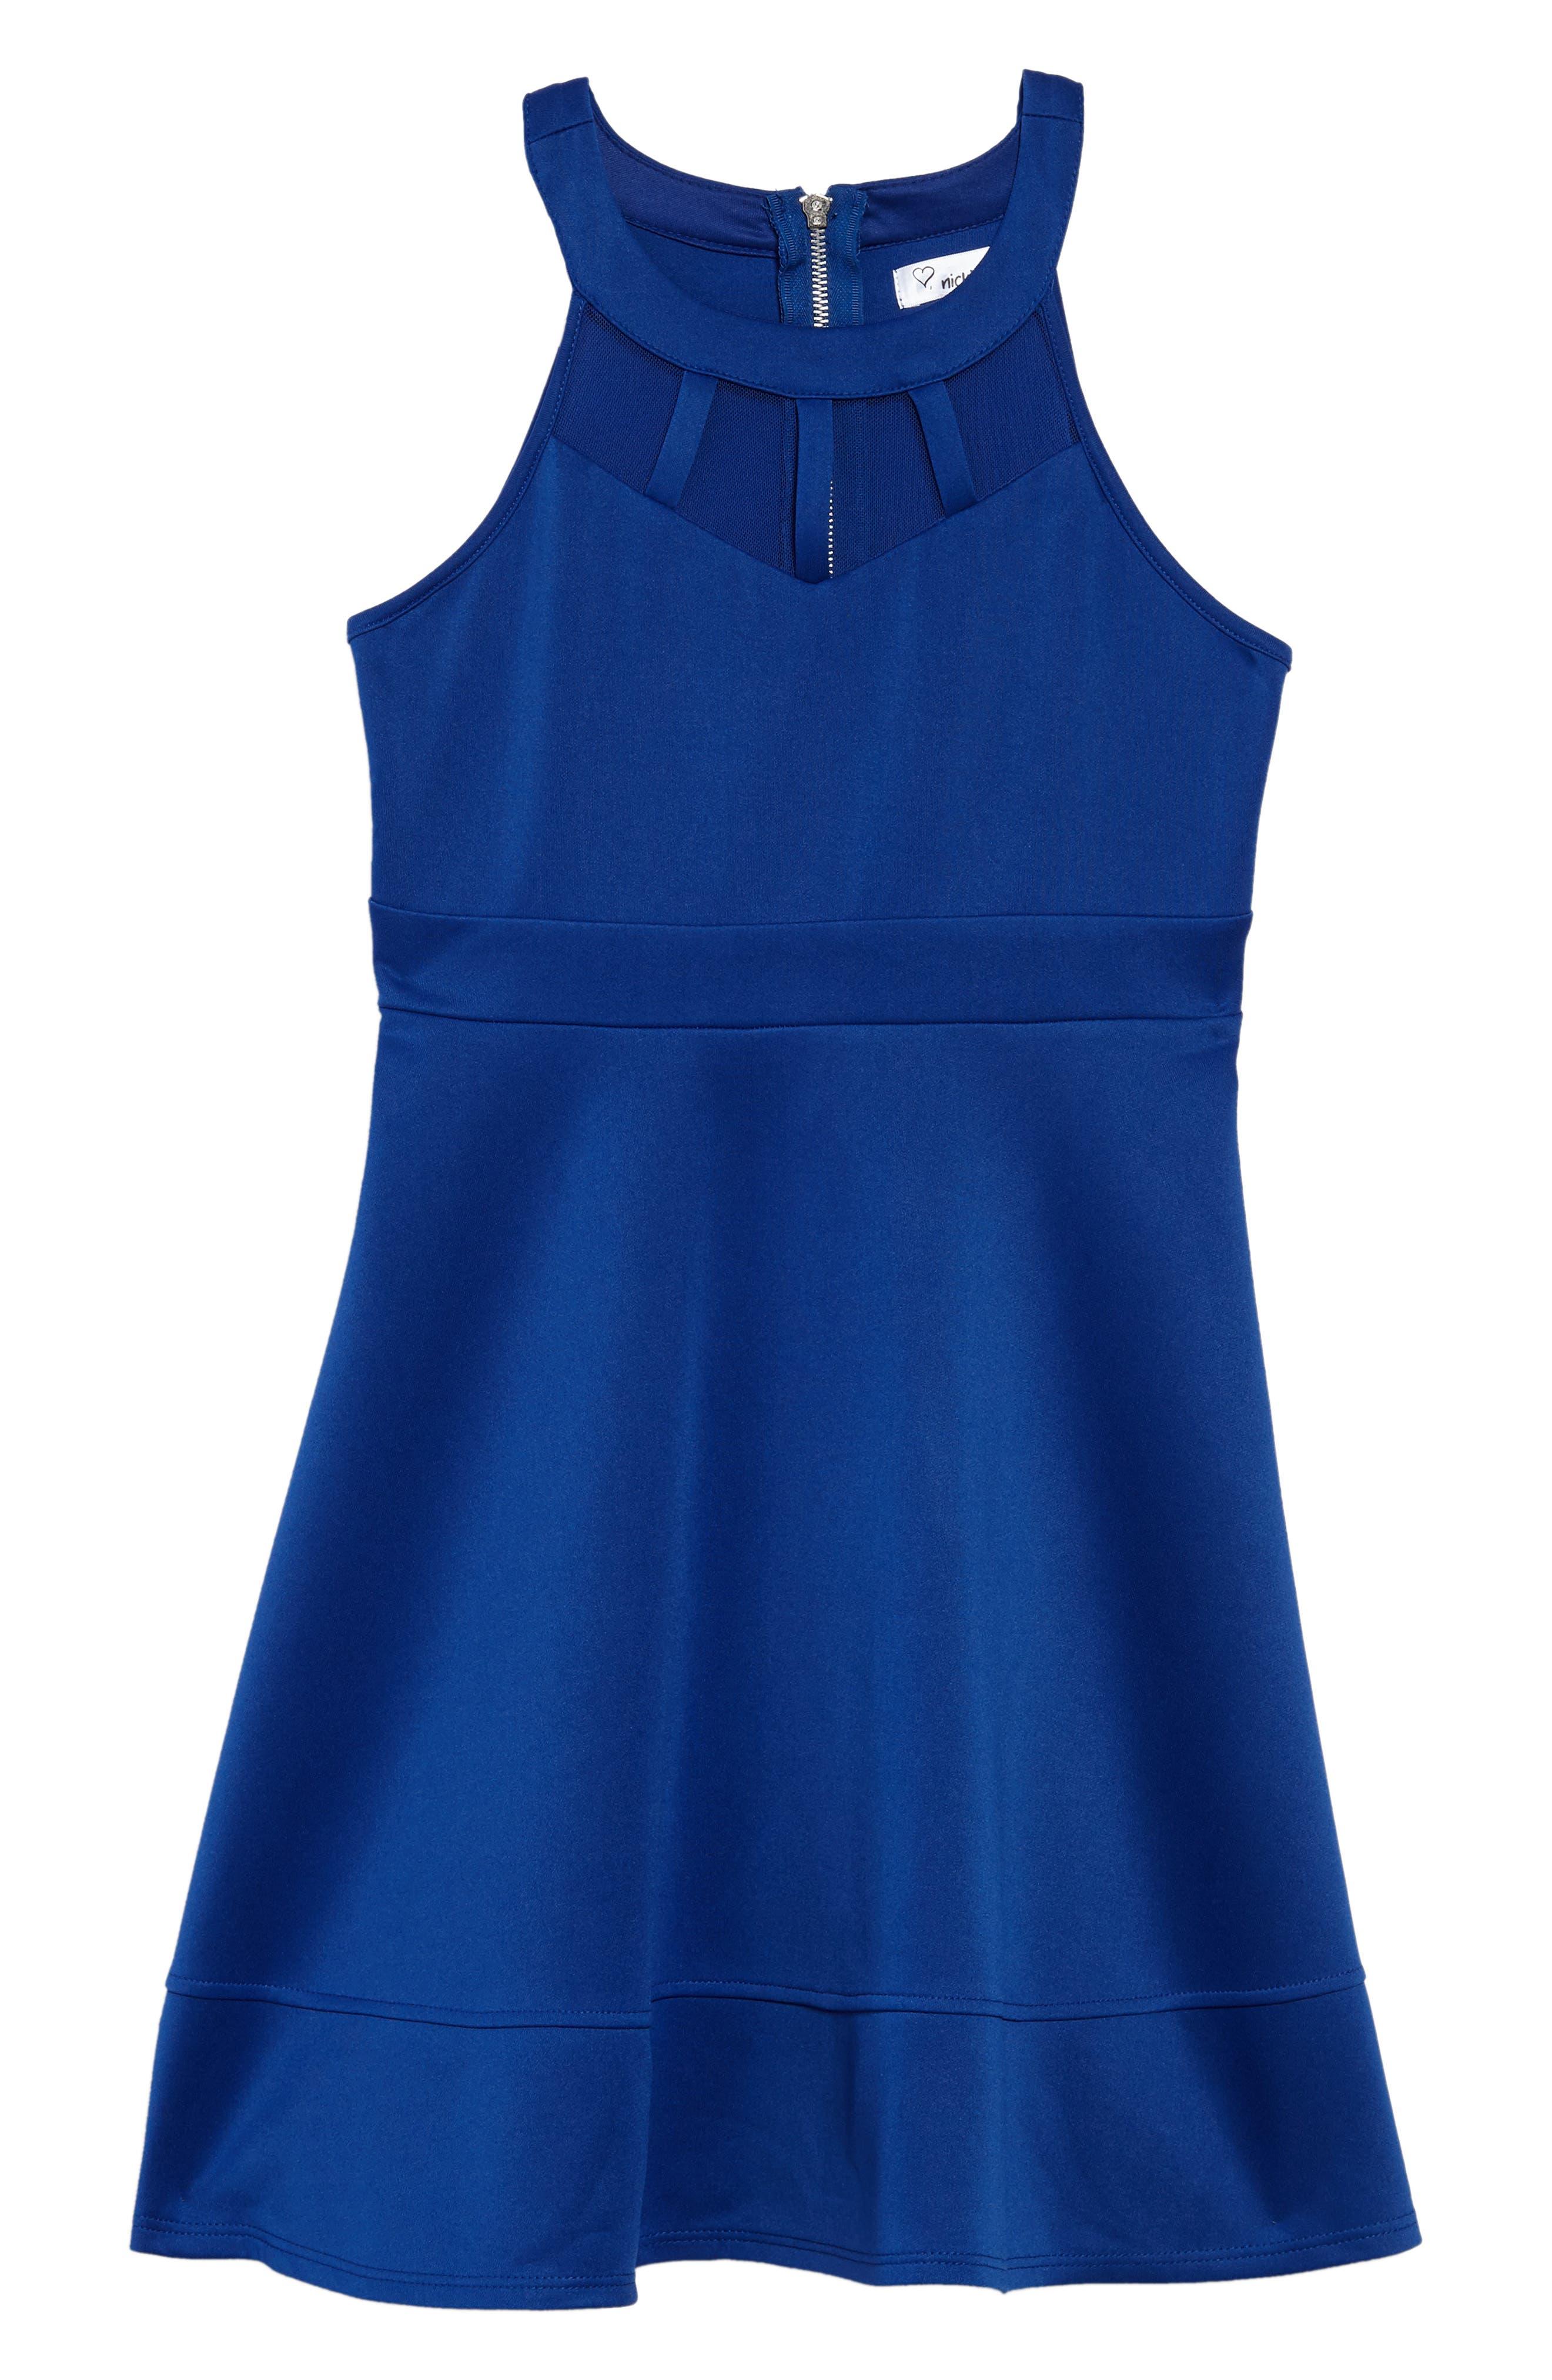 Illusion Neck Skater Dress,                         Main,                         color, Royal